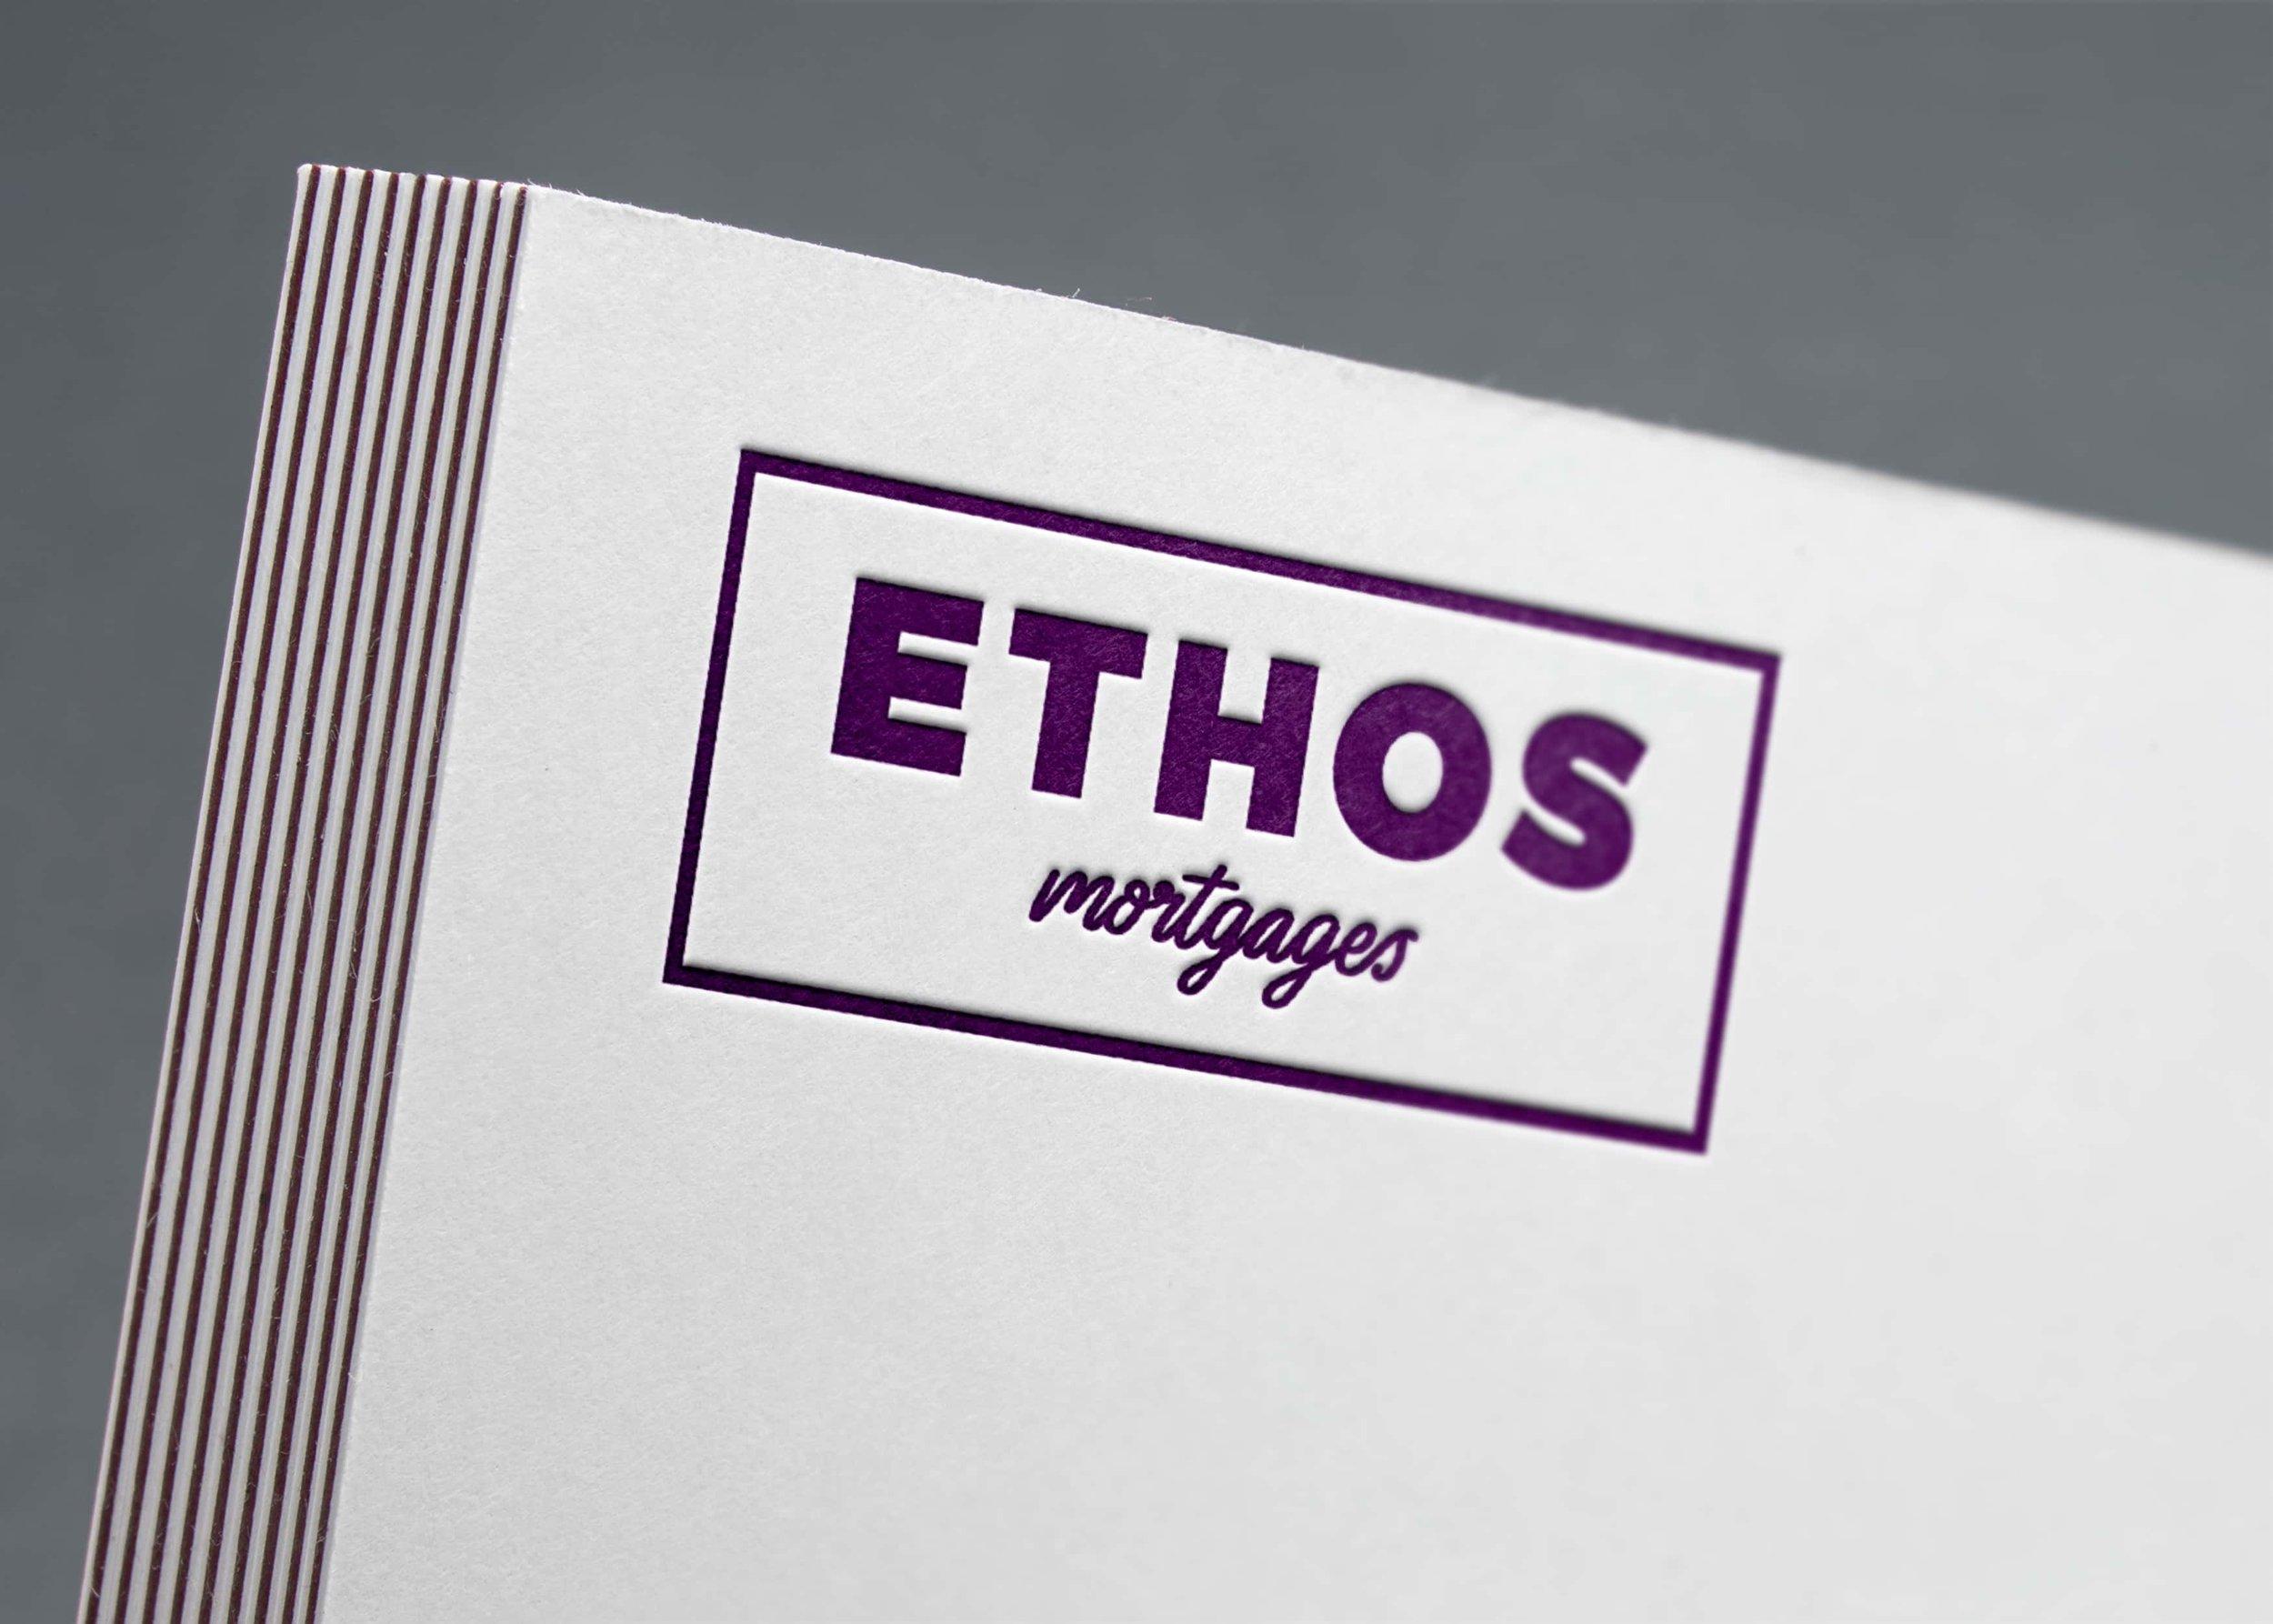 ethos-logo.jpg